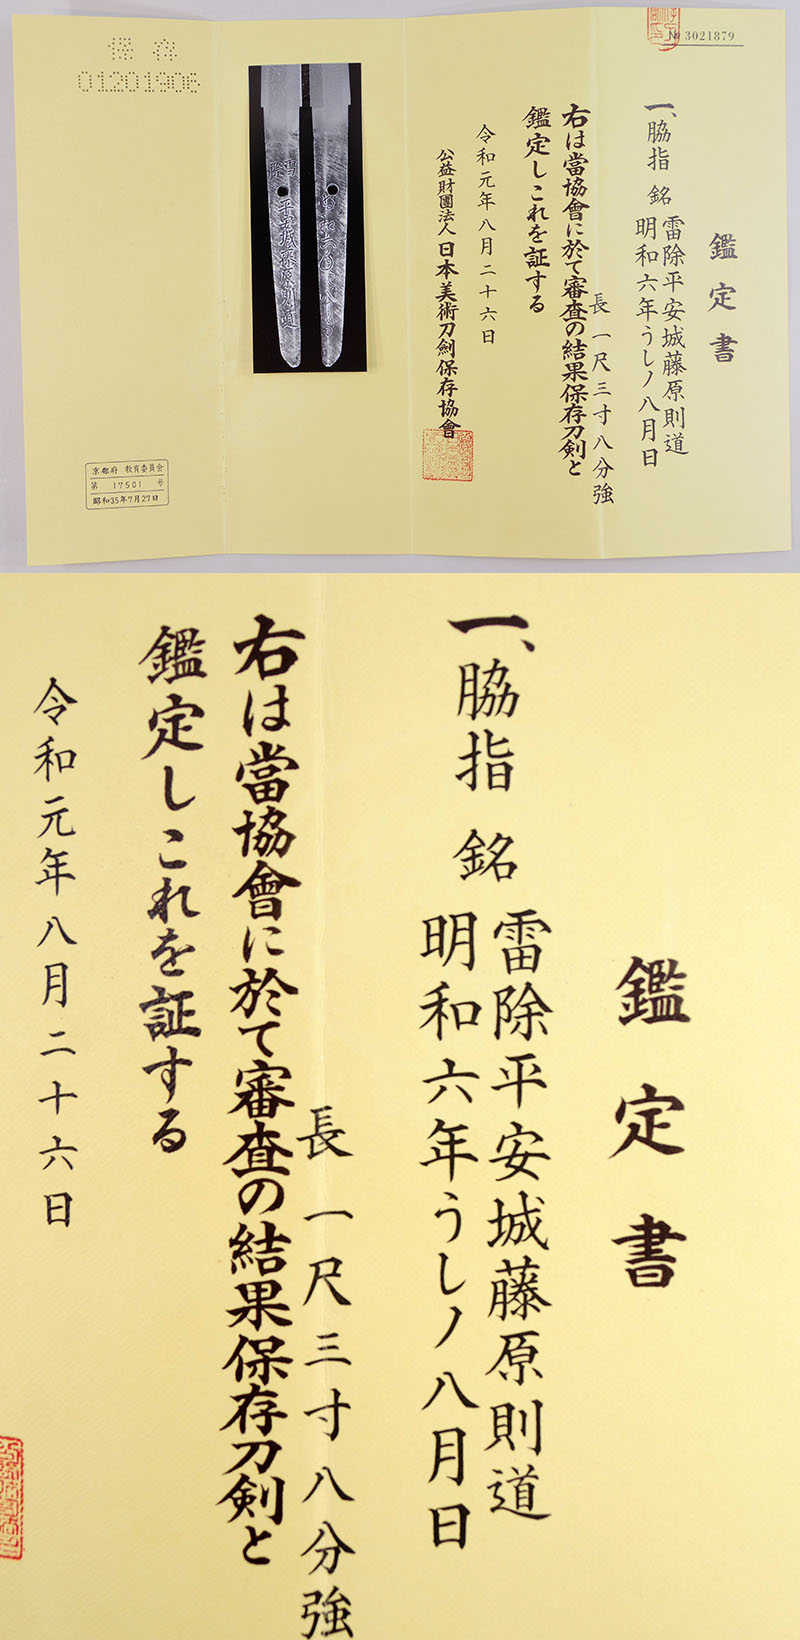 雷除平安城藤原則道 Picture of Certificate